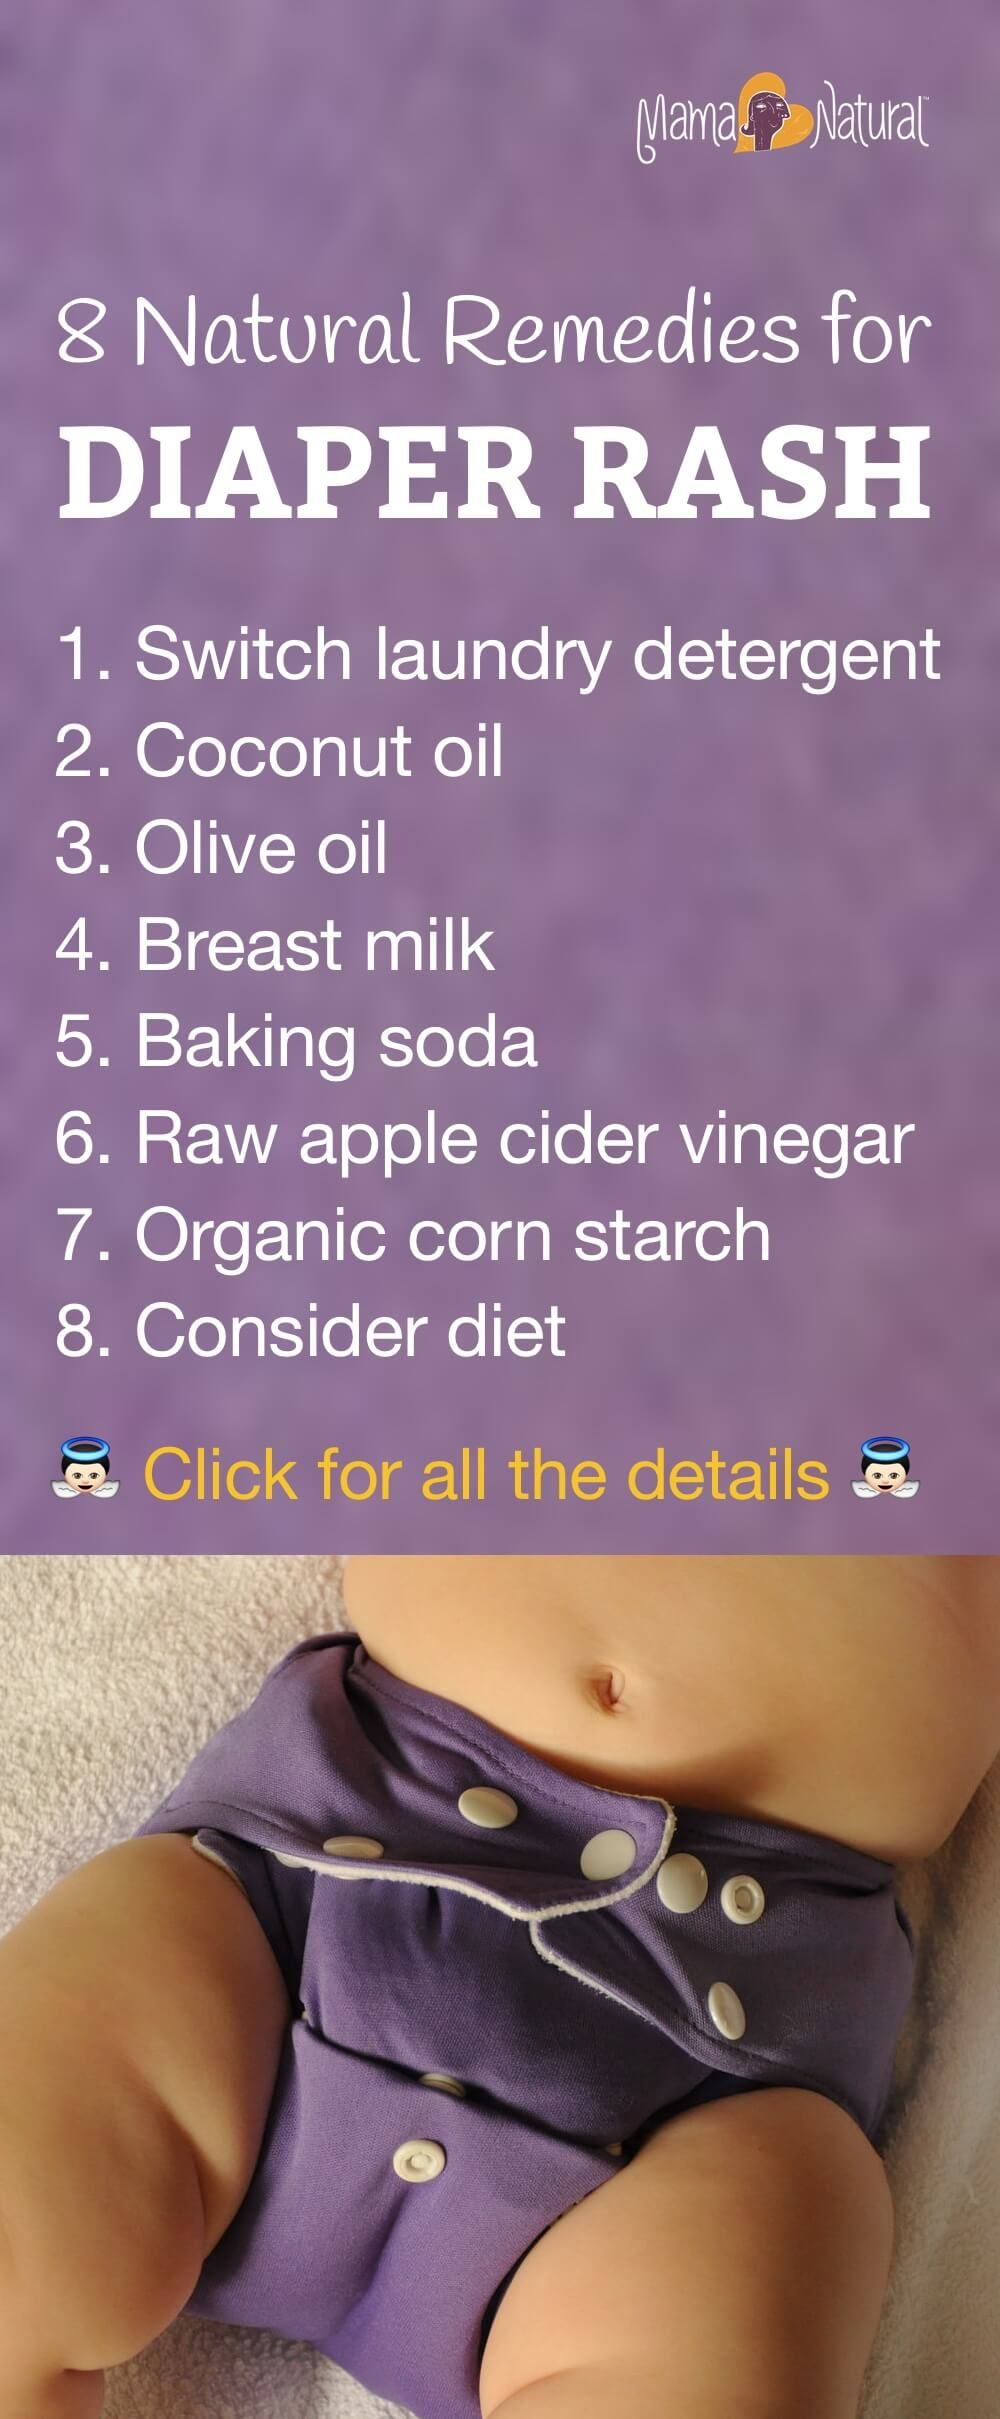 How to treat diaper rash naturally u what causes it pinterest